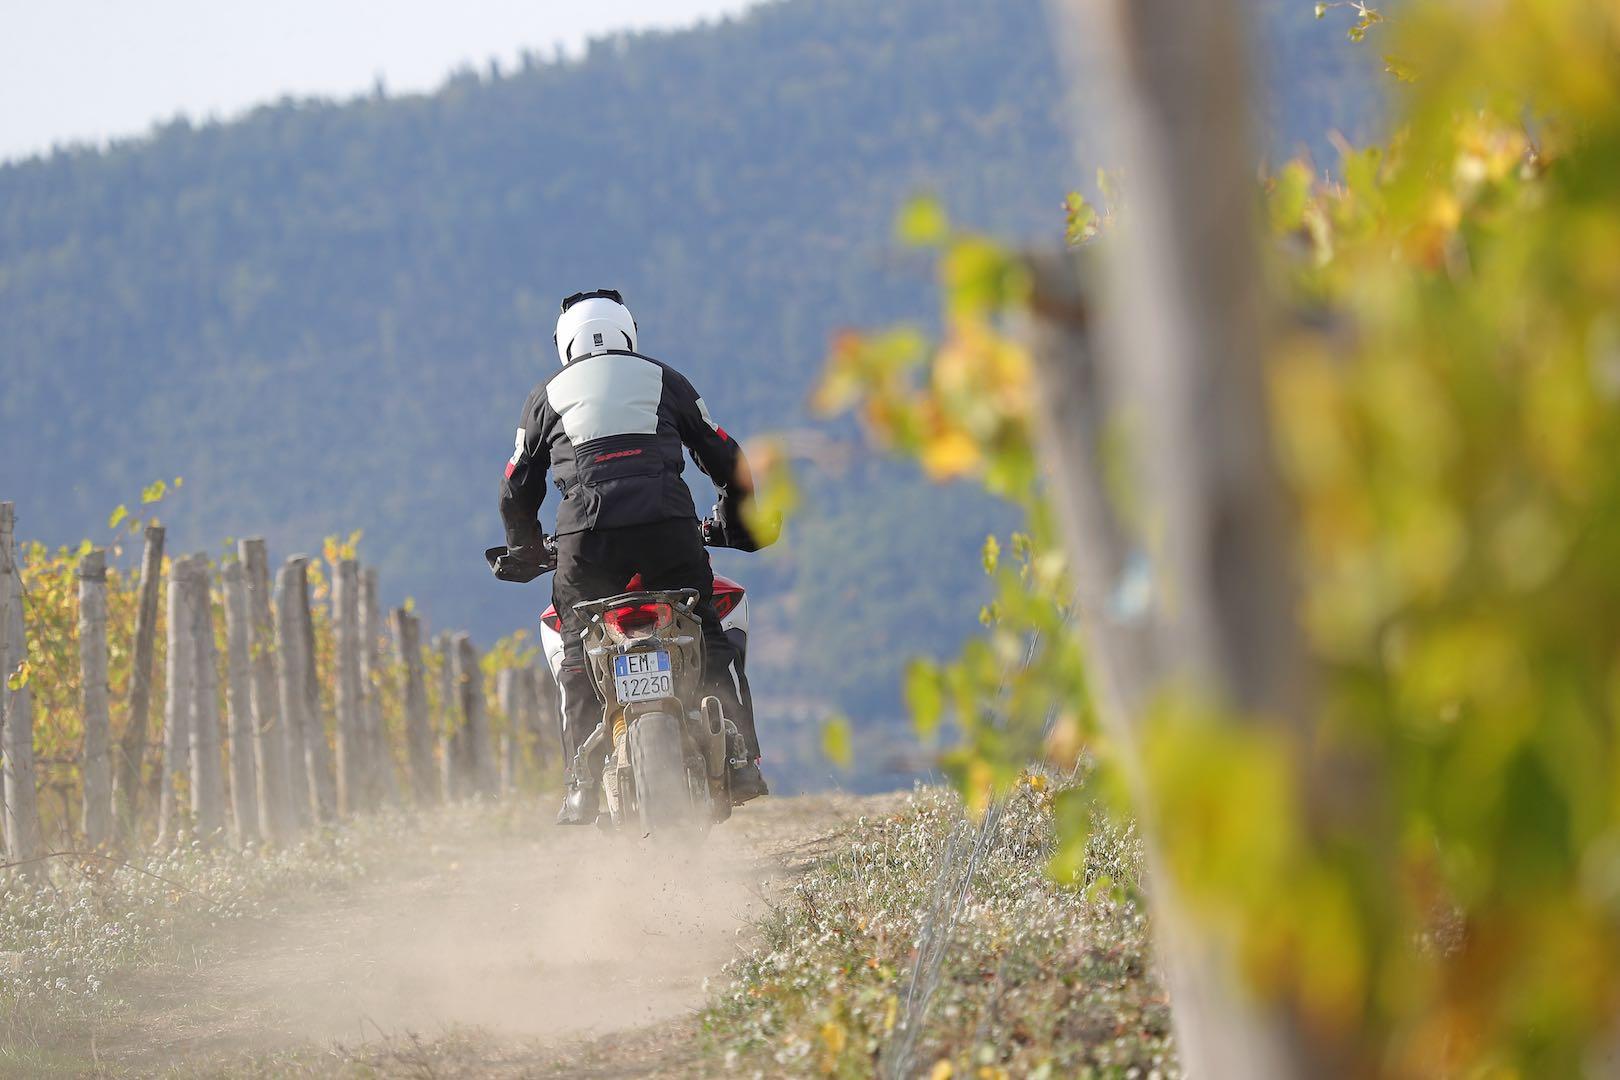 2019 Ducati Multistrada 1260 Enduro wheel